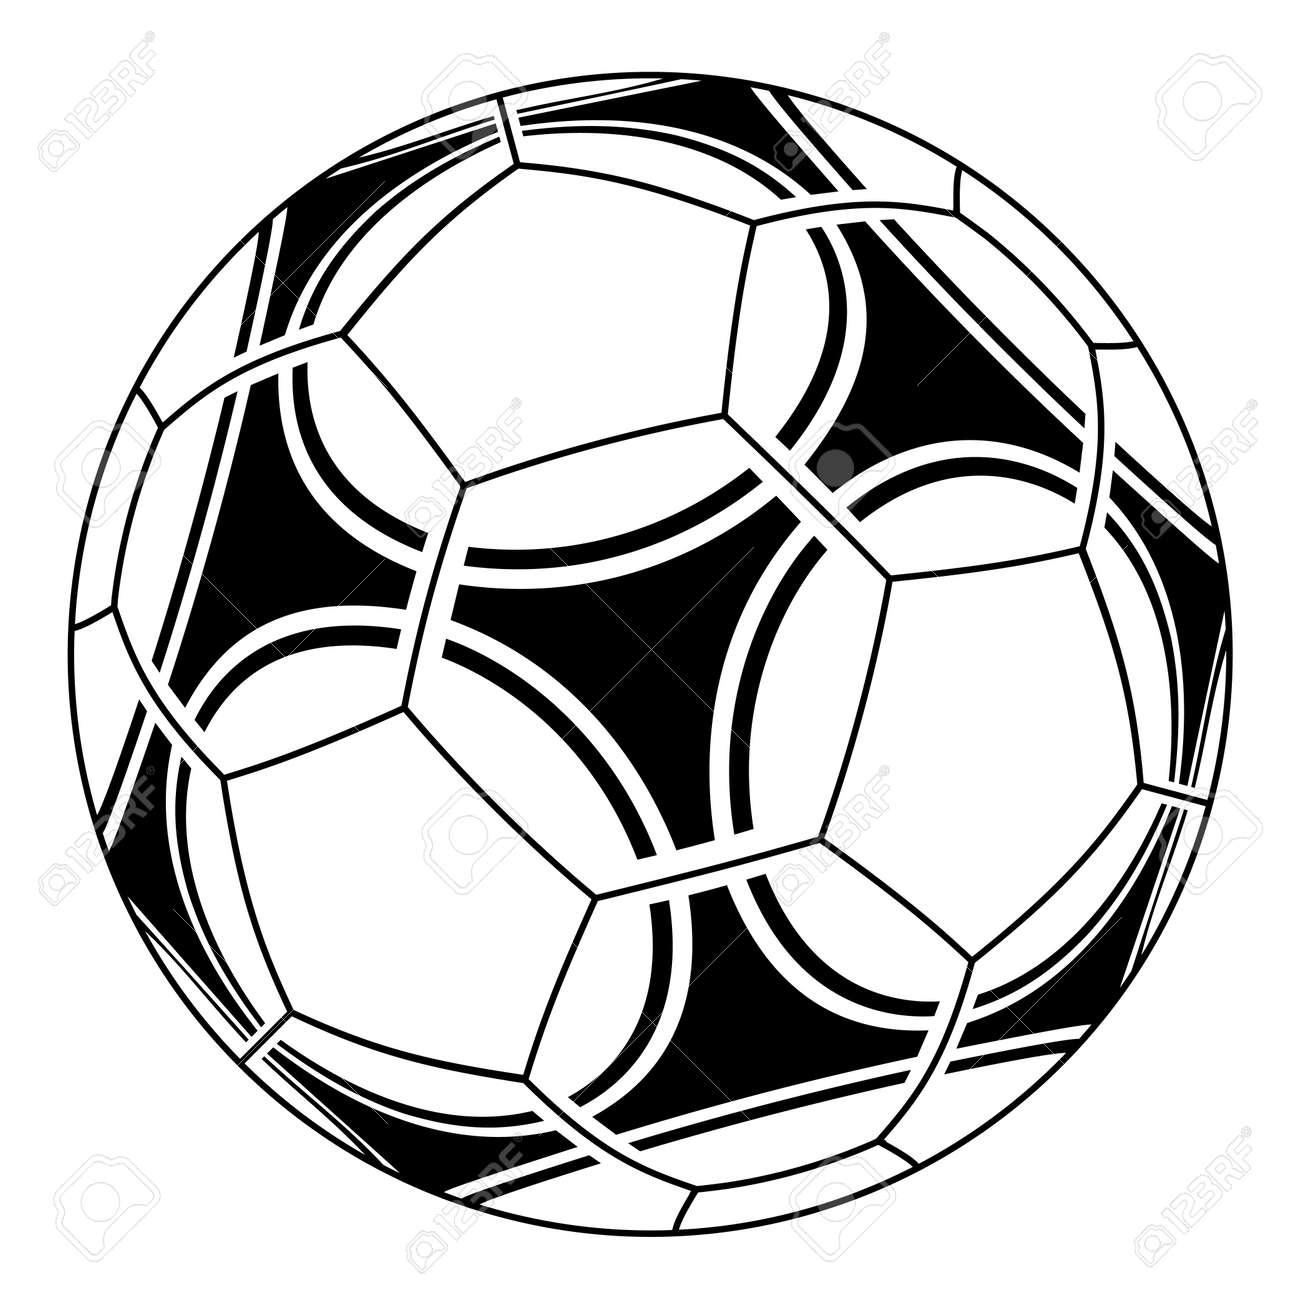 vector soccer ball royalty free cliparts vectors and stock rh 123rf com vector balloons vector ballistic shield